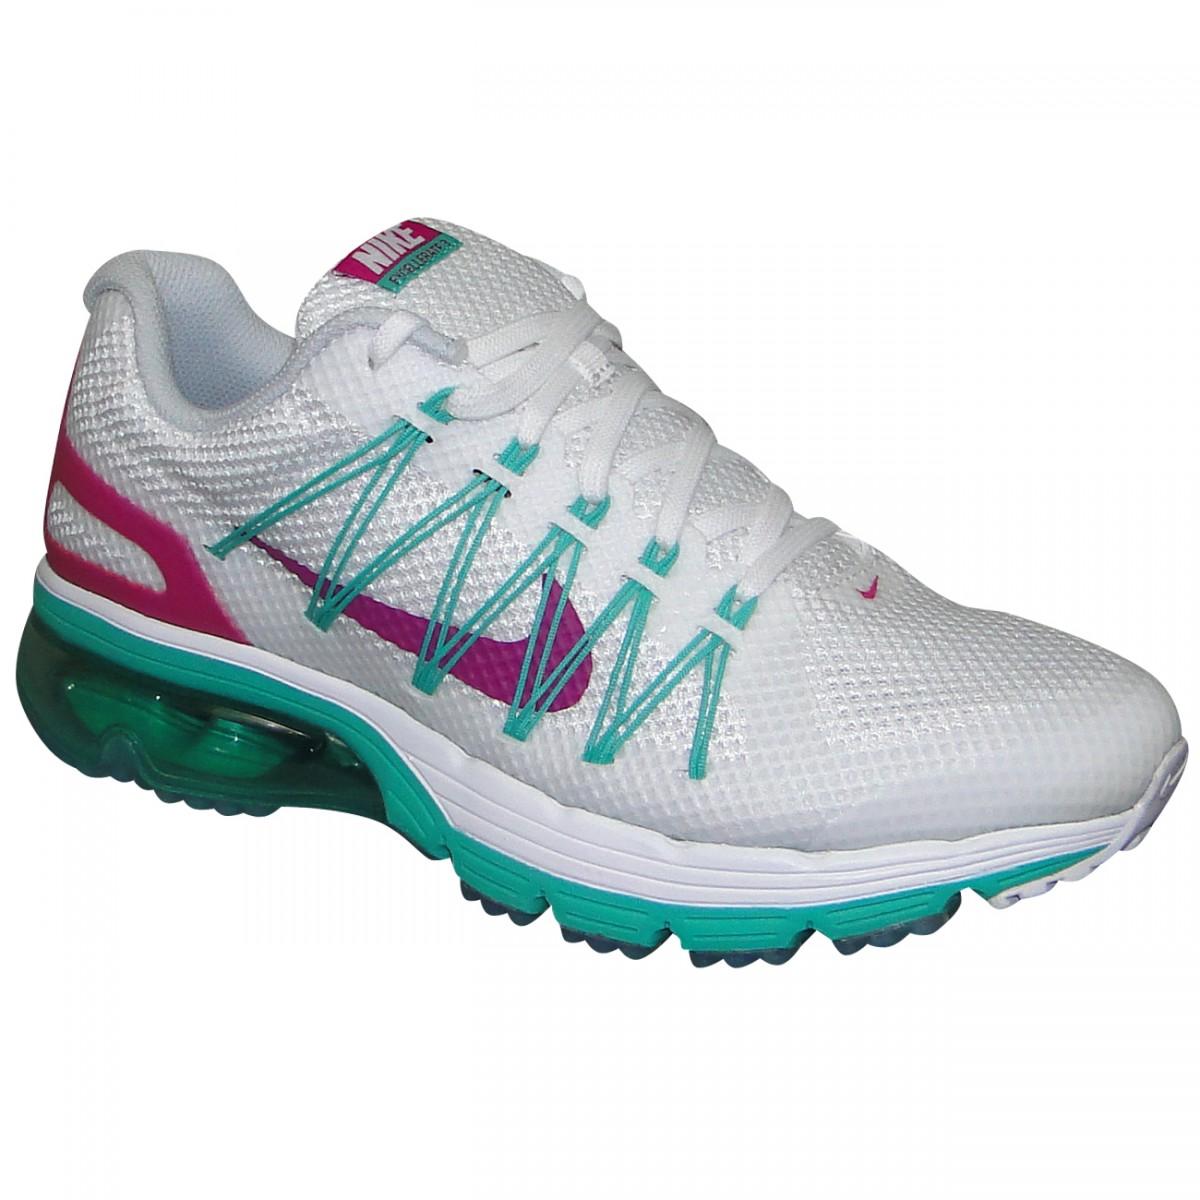 b86a3db3493 Tenis Nike Air Max Excellerate 3 703073-101 - Branco Menta Lilas ...